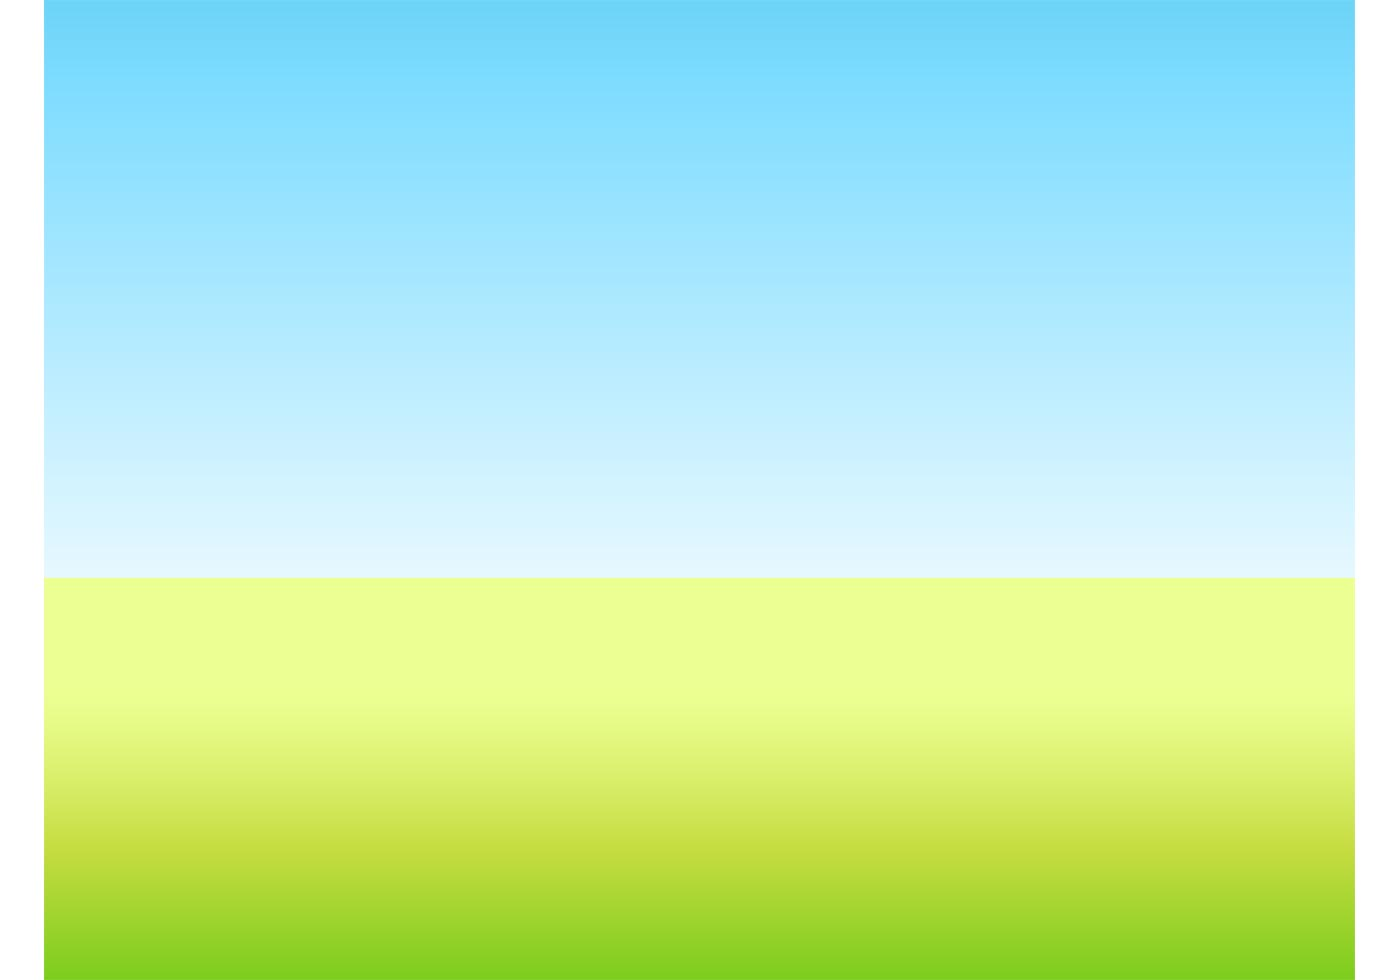 gr-sky-vector Design A Creative Woodland Garden on design design, stone design, woodland bedding, spring design, woodland flowers, woodland ecosystem, orchard design, summer design, woodland food web, woodland landscaping, snow design, woodland landscape, woodland cottage gardens, seeds design, woodland fabric, woodland indian artifacts,